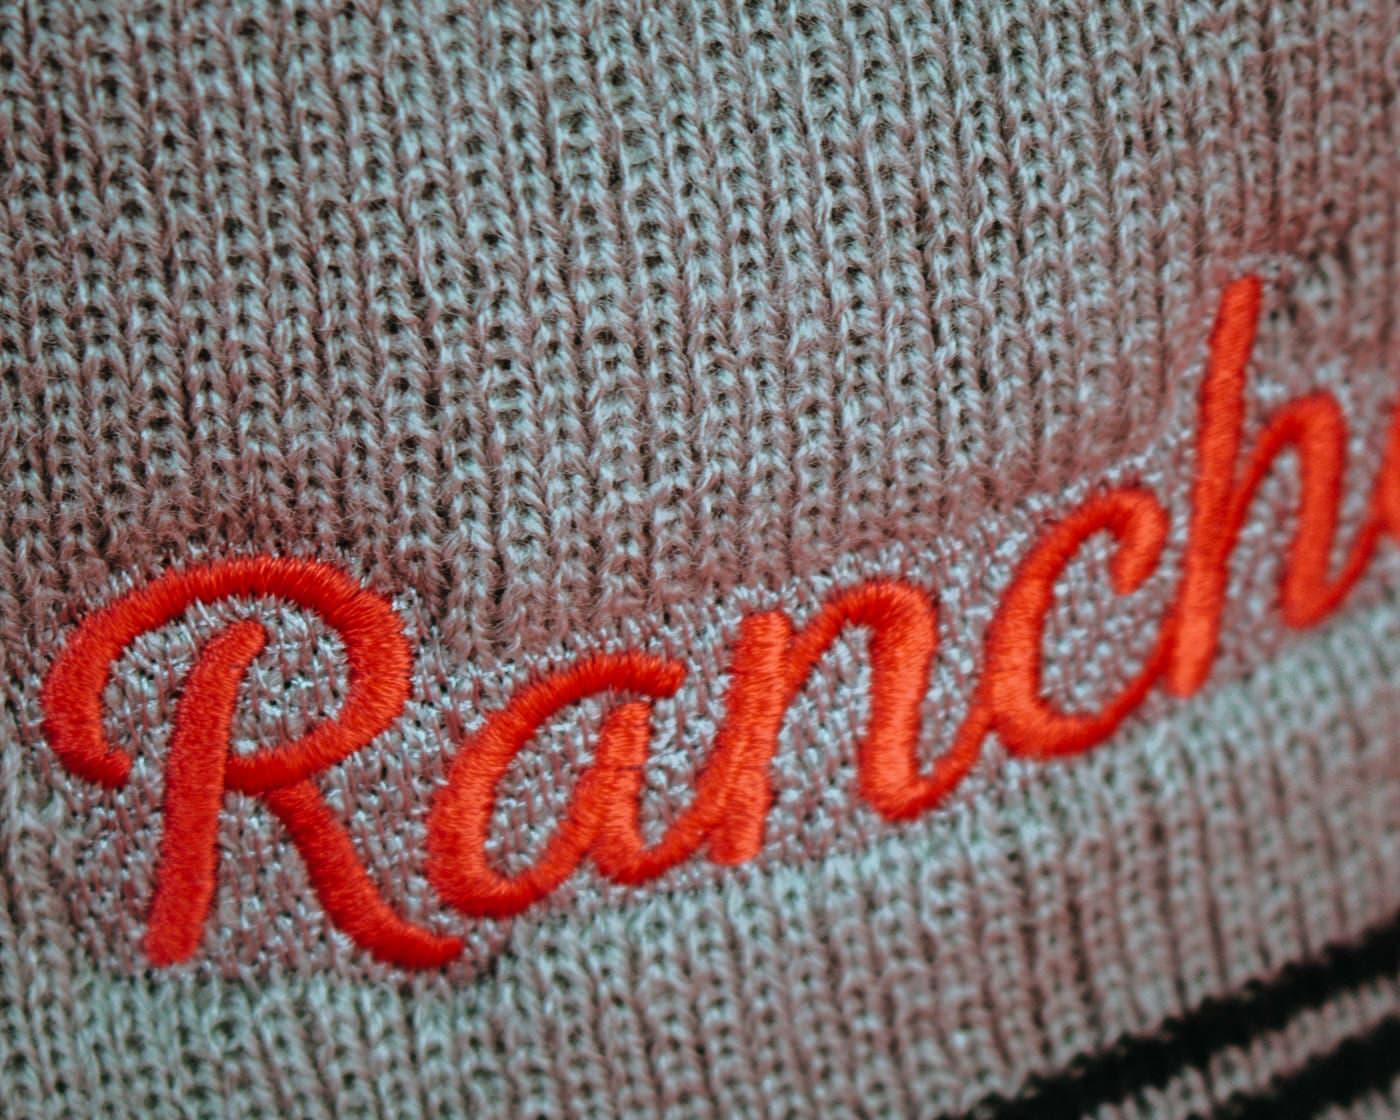 Hats Beanie Rancher Emrboidery-5